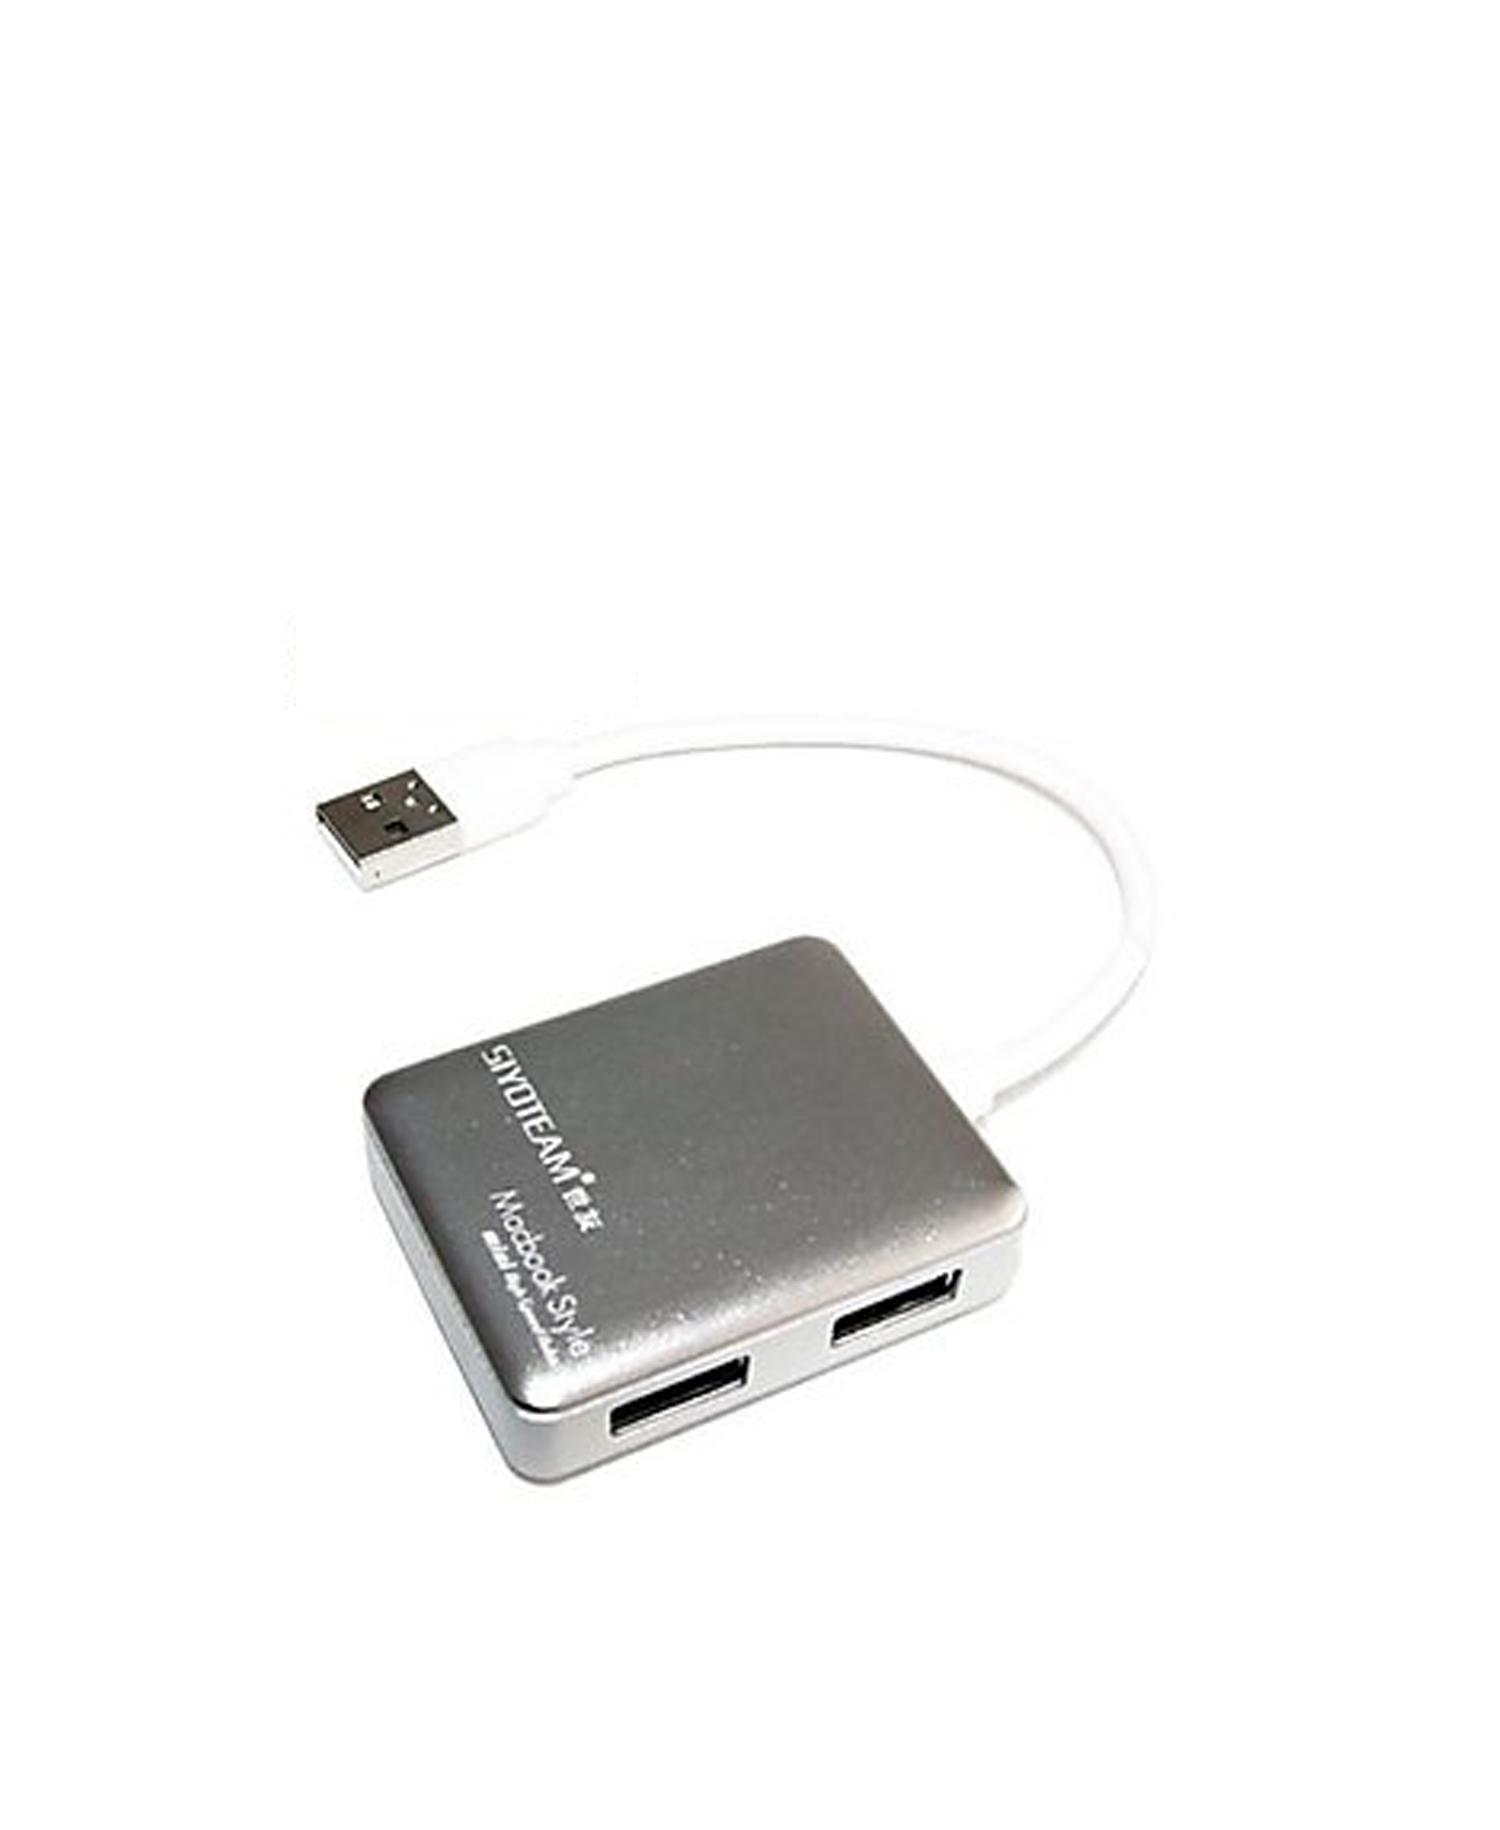 233876091a0 Siyoteam USB 2.0 High Speed Hub